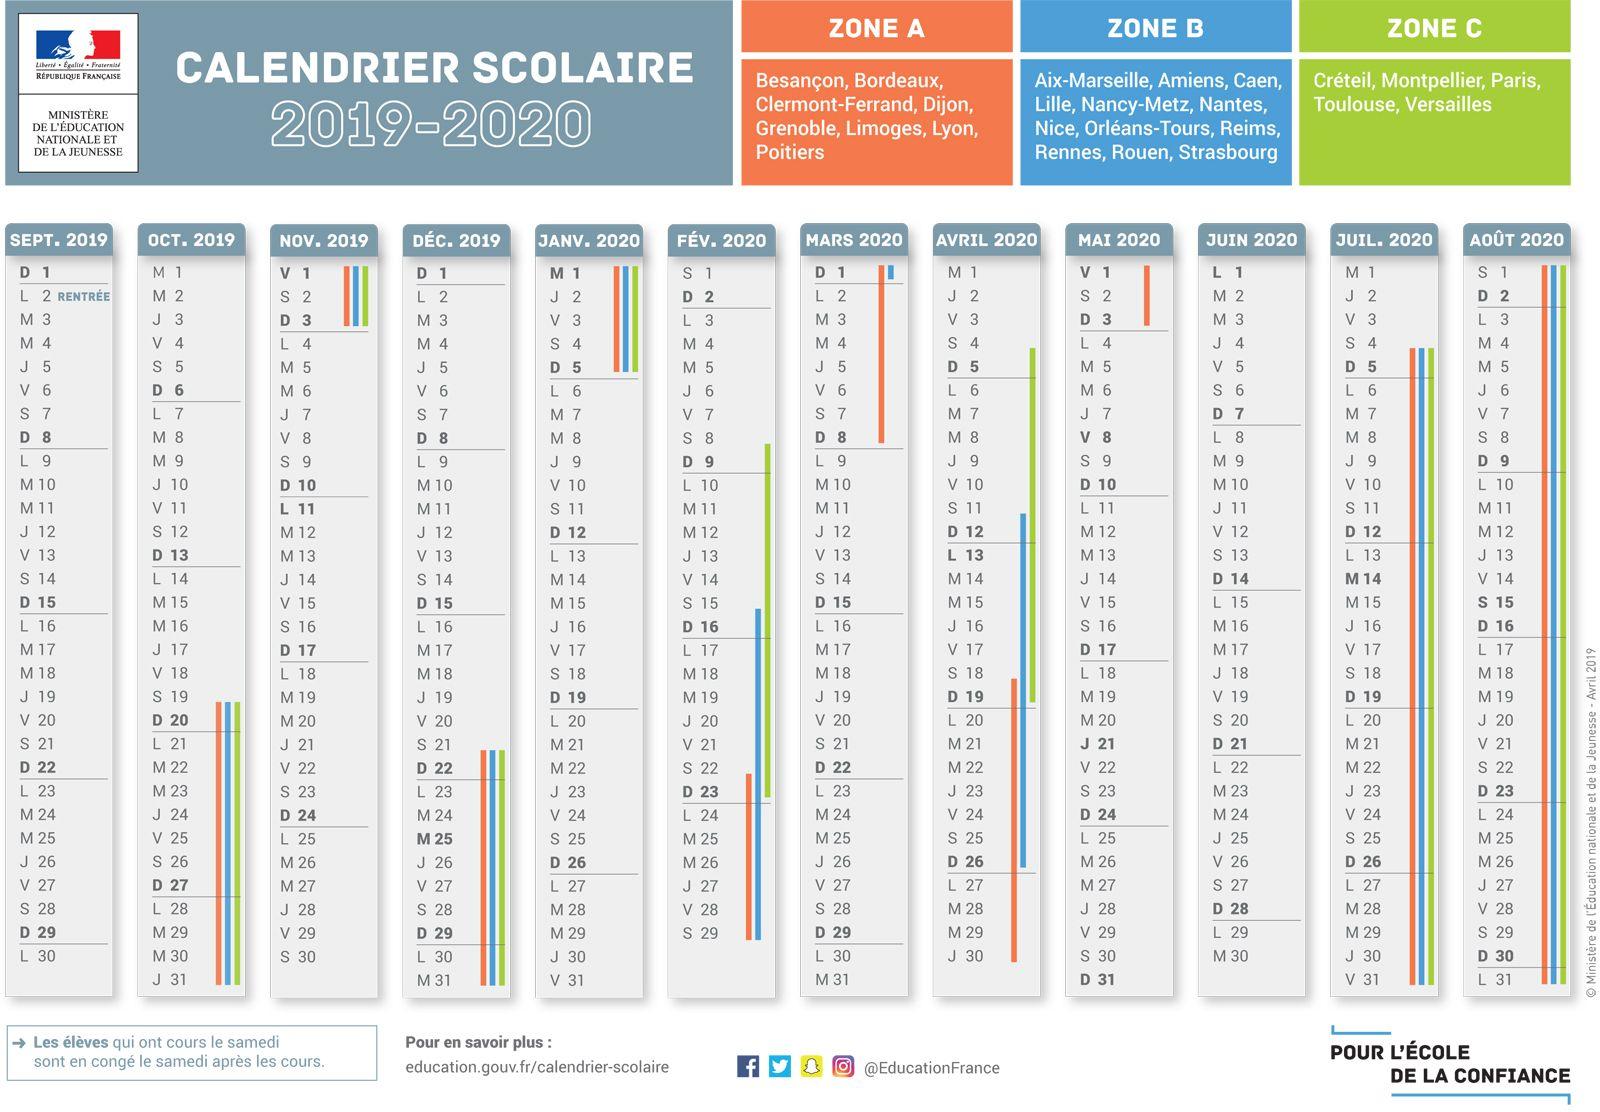 Calendrier 2019 2020 A Imprimer.Le Calendrier Scolaire Calendrier Scolaire Calendrier